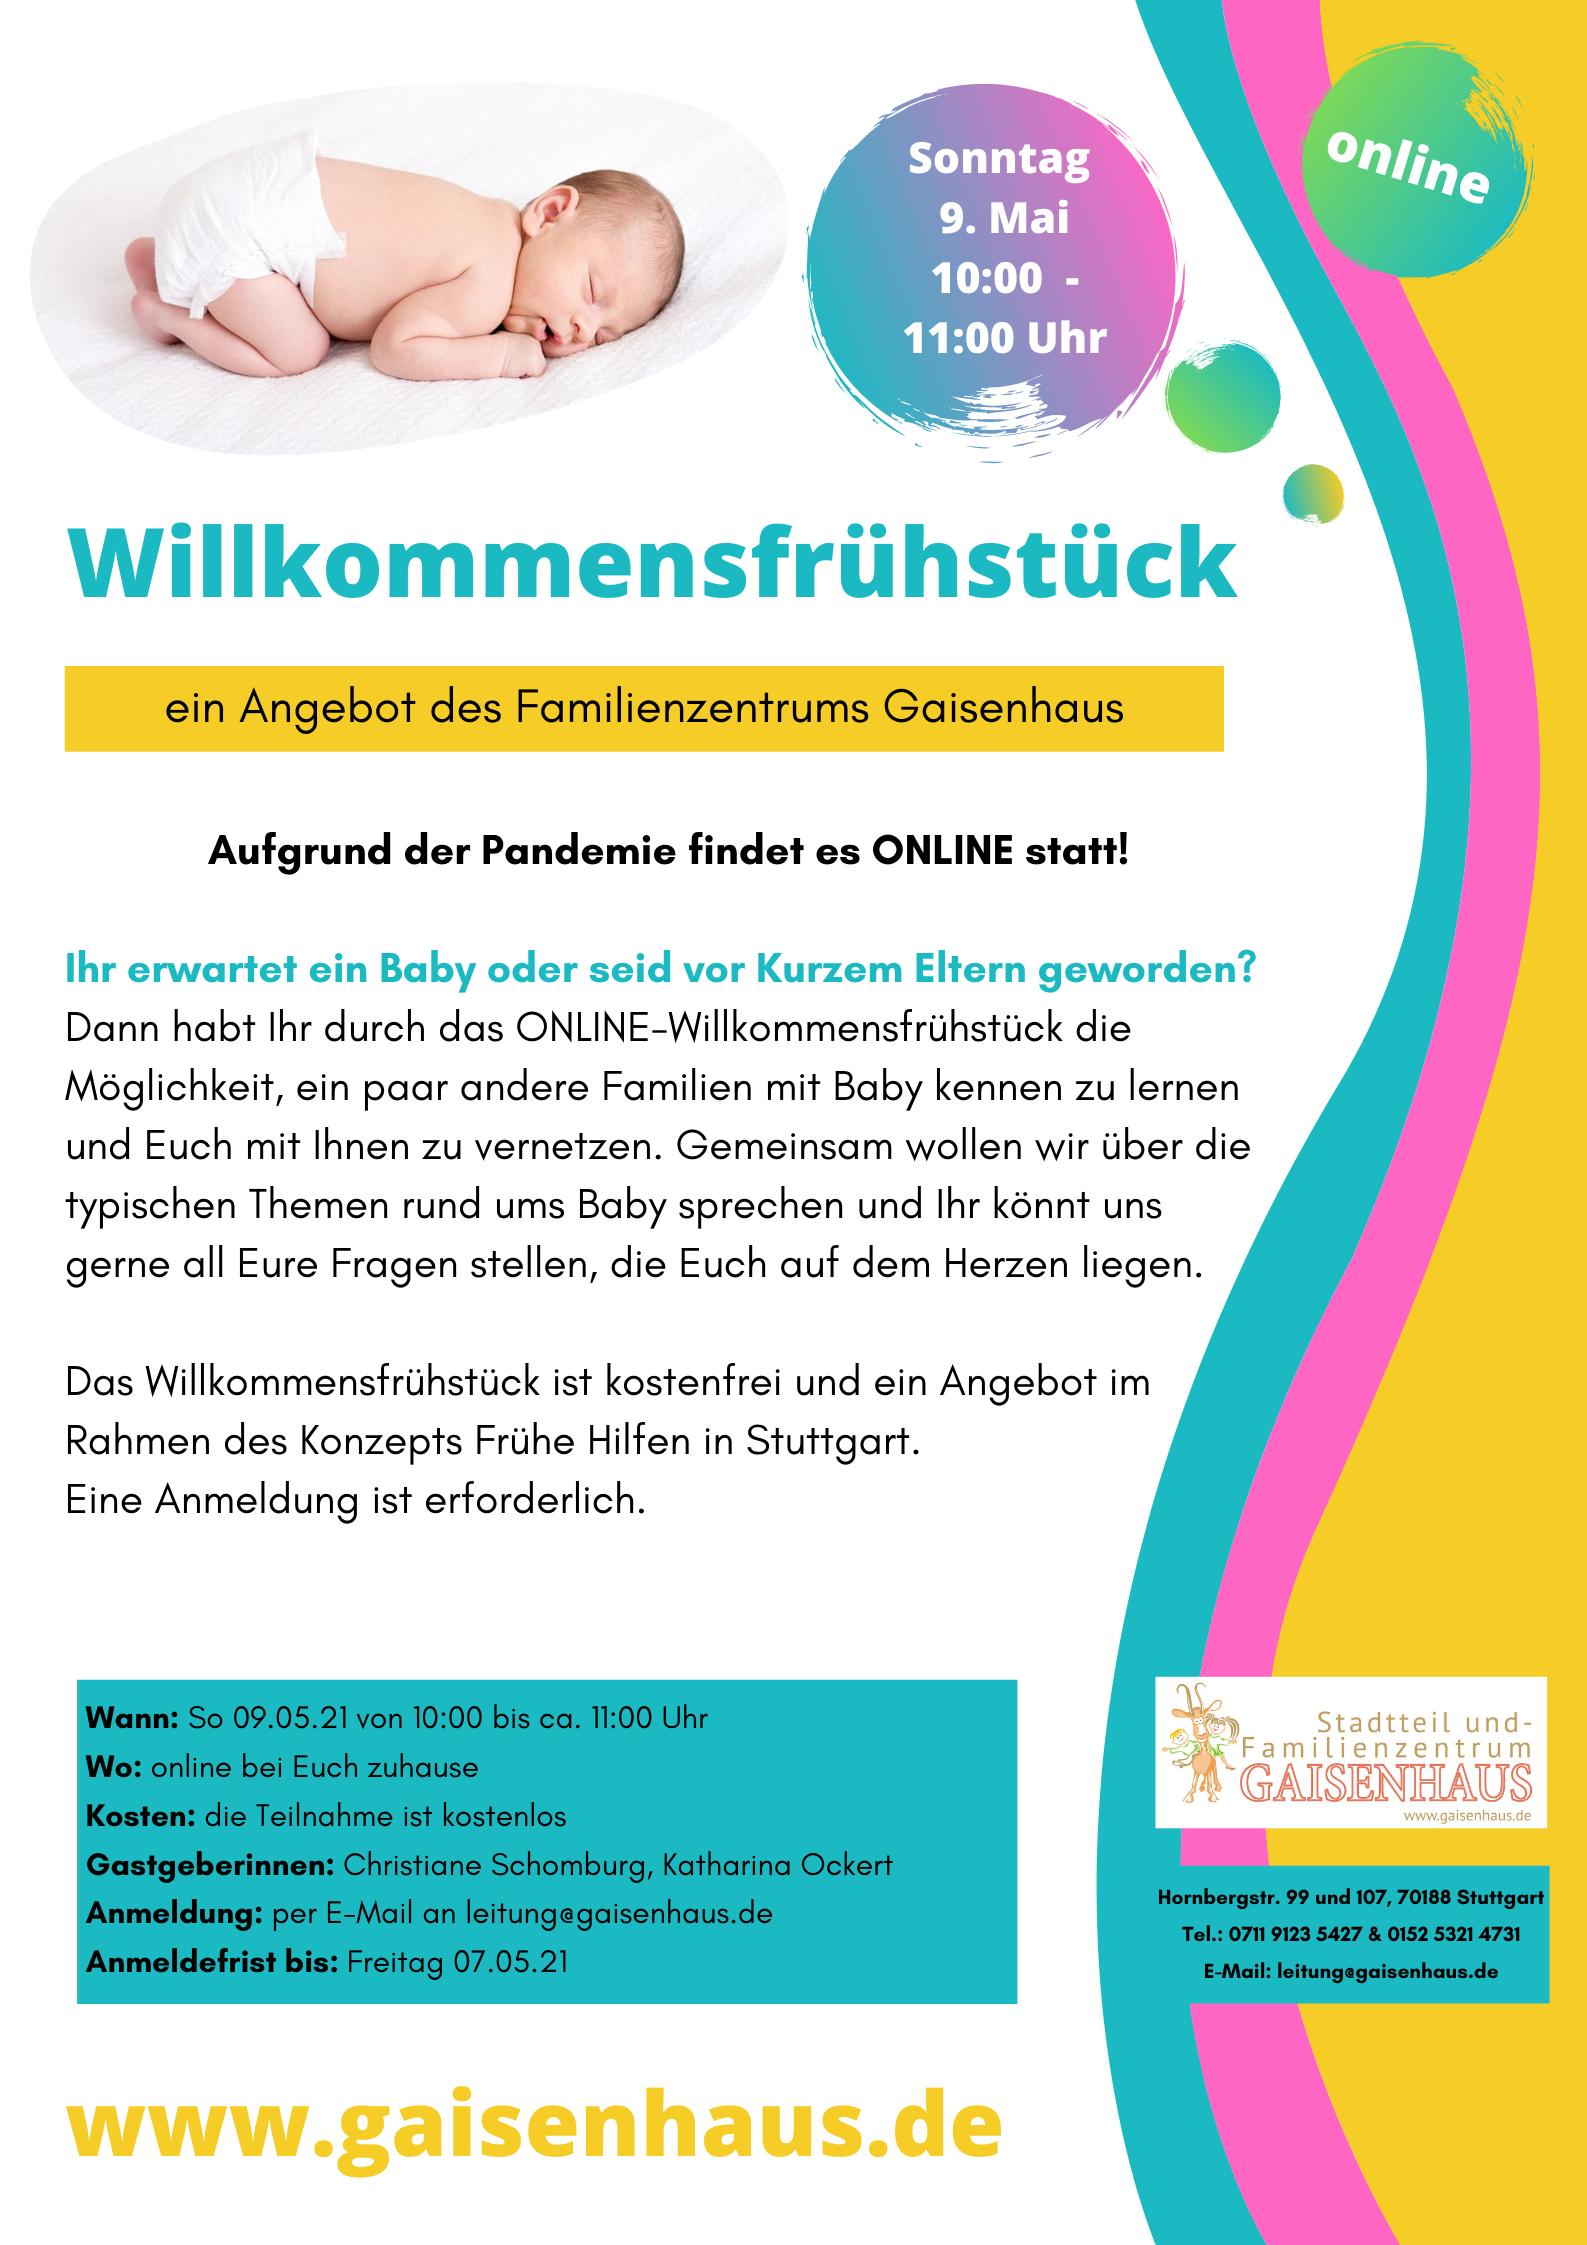 willkommensfruehstueck-online-9.5.2021